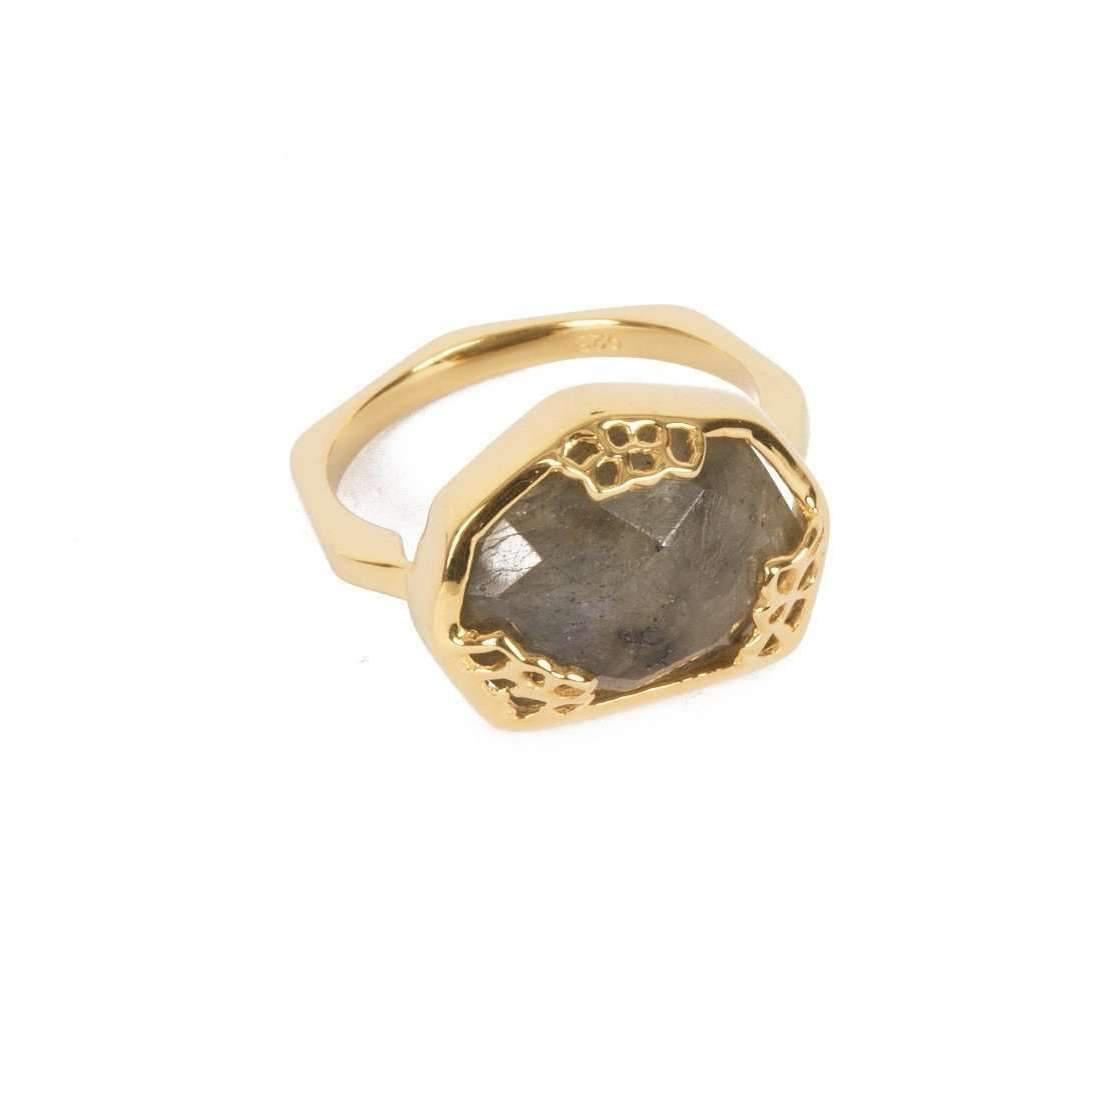 Neola Honeycomb Gold Ring - UK P - US 7 1/2 - EU 56 1/2 cTTGS3